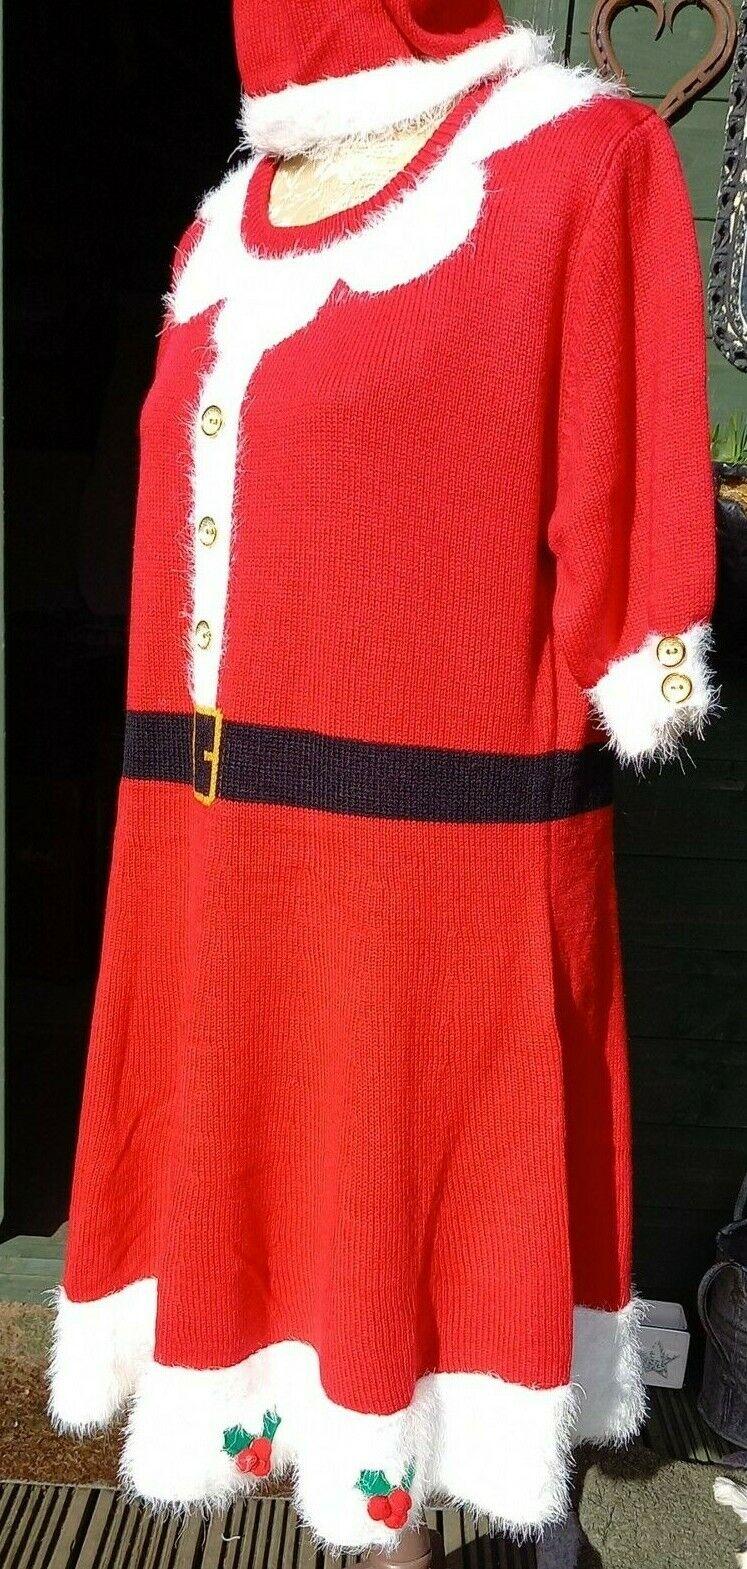 PRIMARK Mrs. Santa Scarlet Knit Dress with Detachable Hood/Hat BNWT size L 14/16